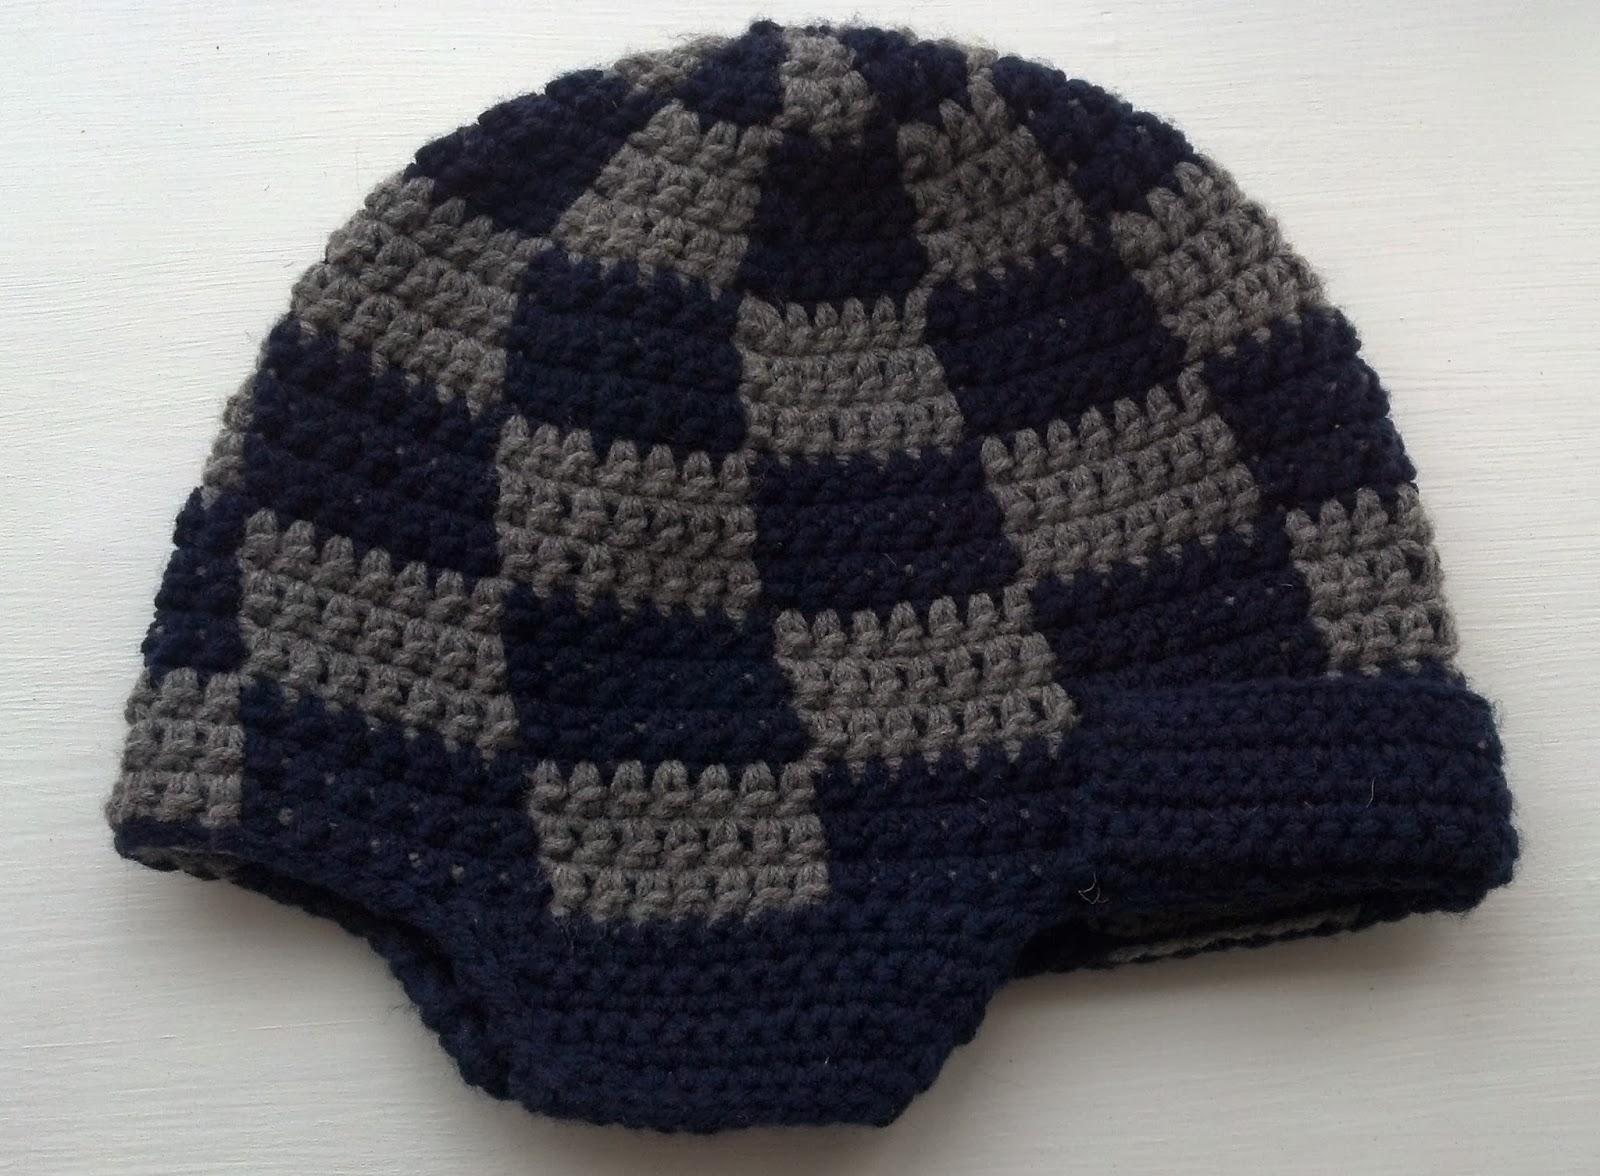 Checkered Knitting Pattern : Pattern: Checkered Hunting Hat Knit A Bit Crochet Away